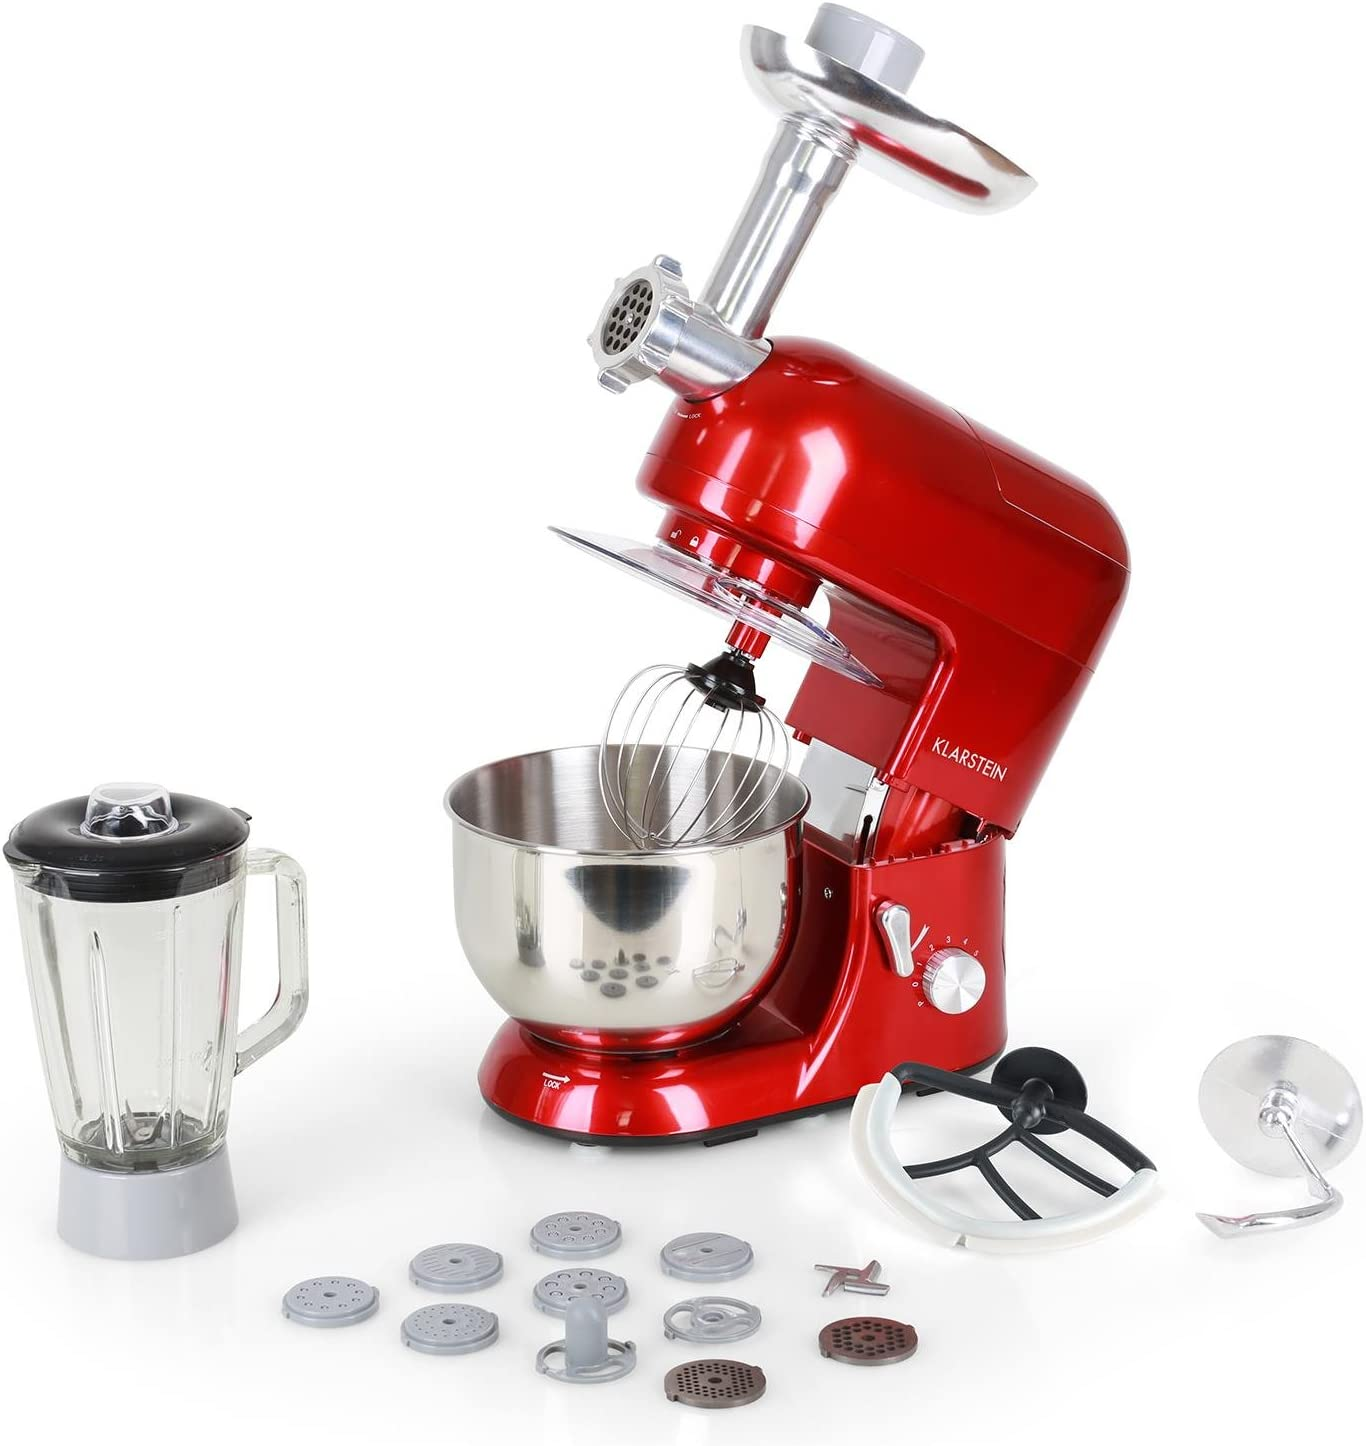 Klarstein Lucia Rossa 1200W 5L Rojo - Robot de cocina (5 L, Rojo, 1,5 L, Acero inoxidable, 1200 W, 230 mm): Amazon.es: Hogar